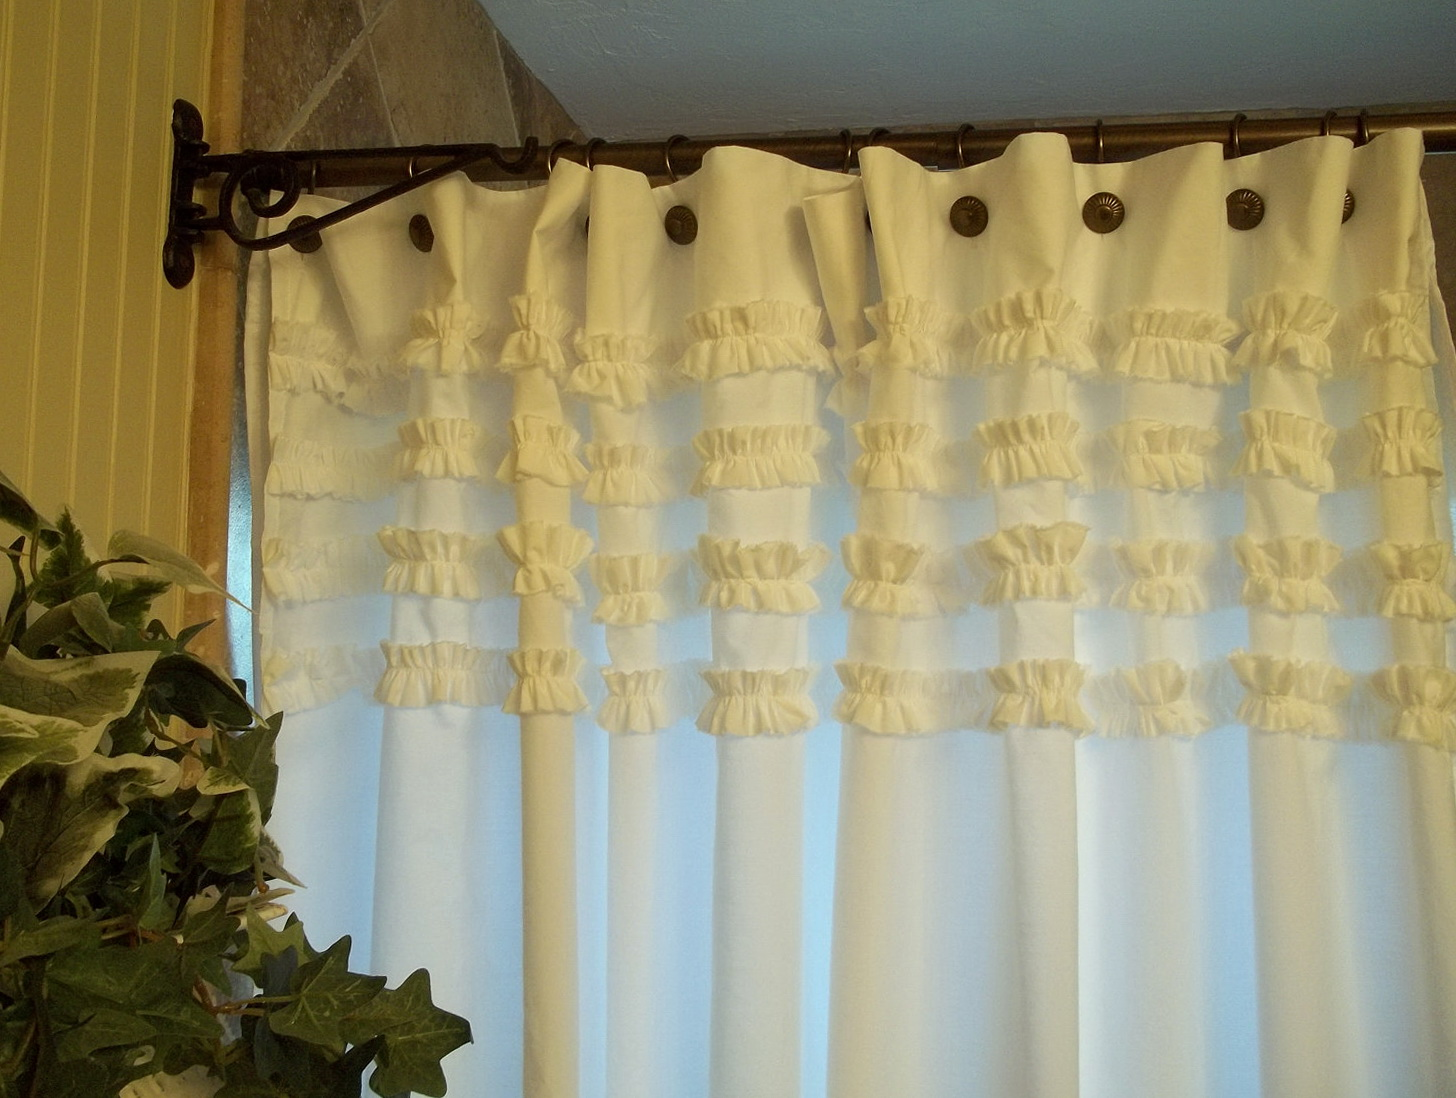 white ruffle curtains target home design ideas. Black Bedroom Furniture Sets. Home Design Ideas